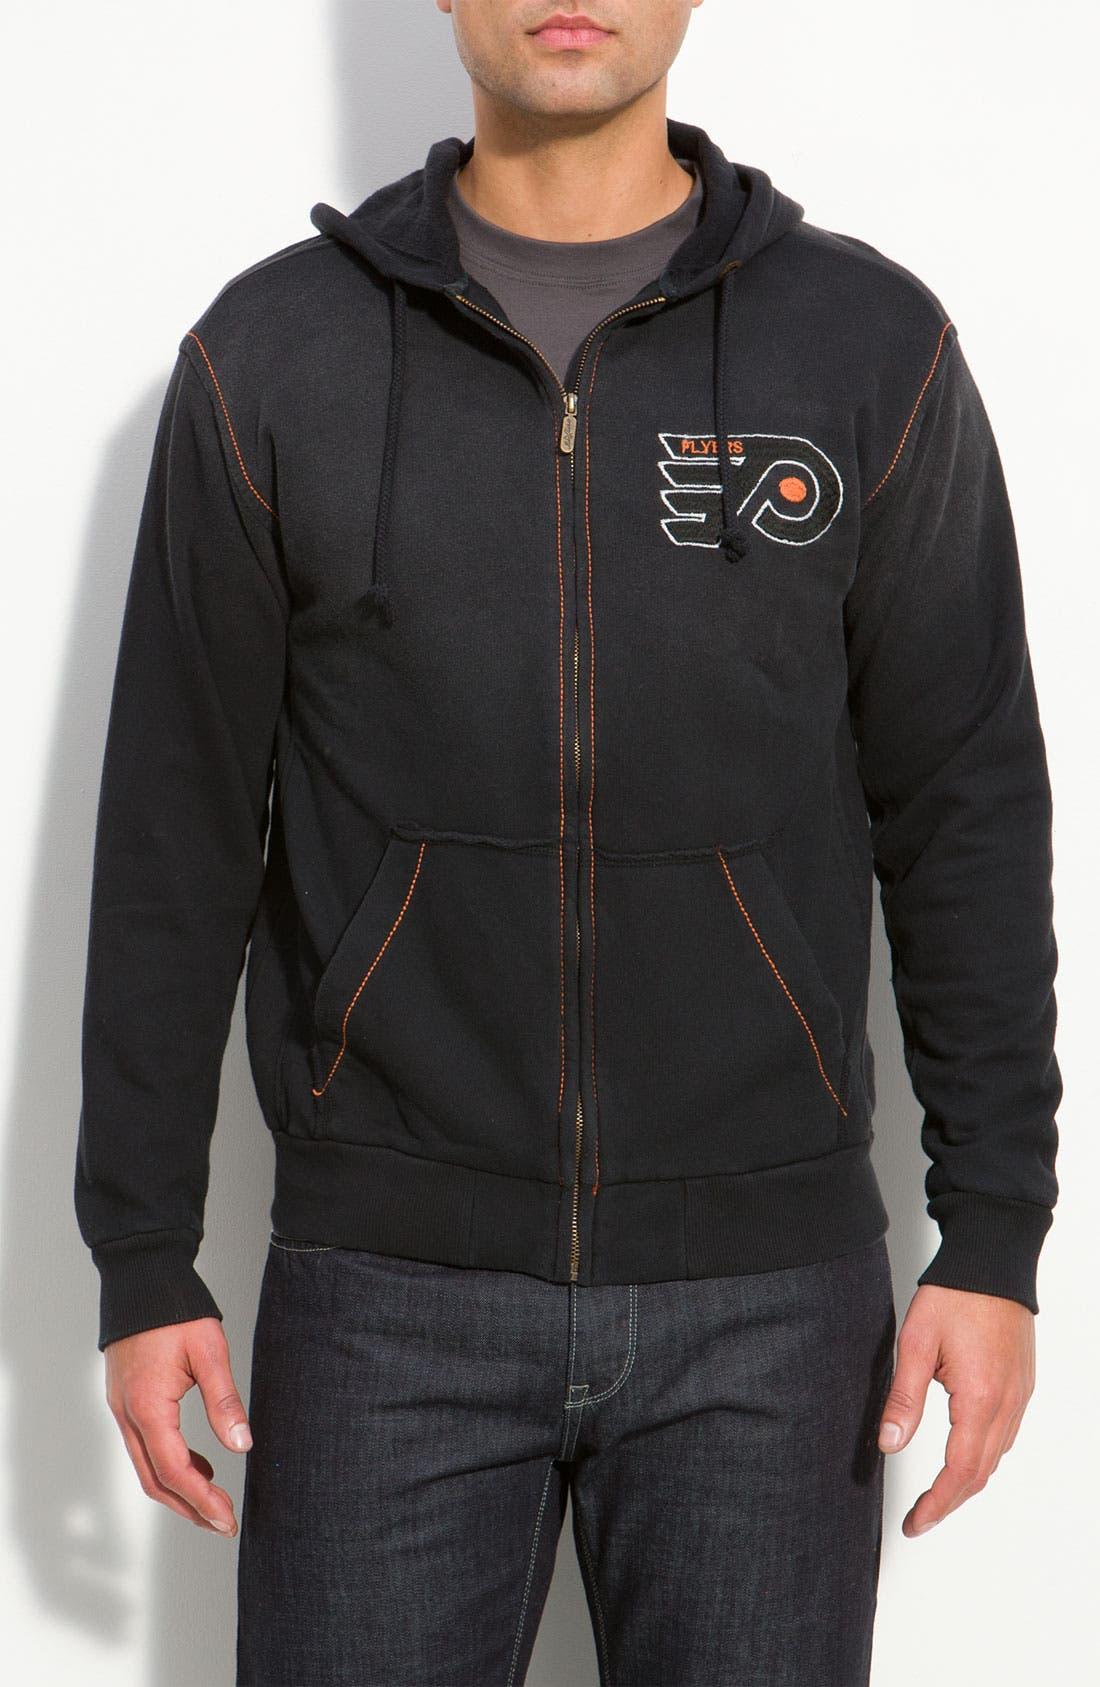 Main Image - Red Jacket 'Flyers' Hoodie